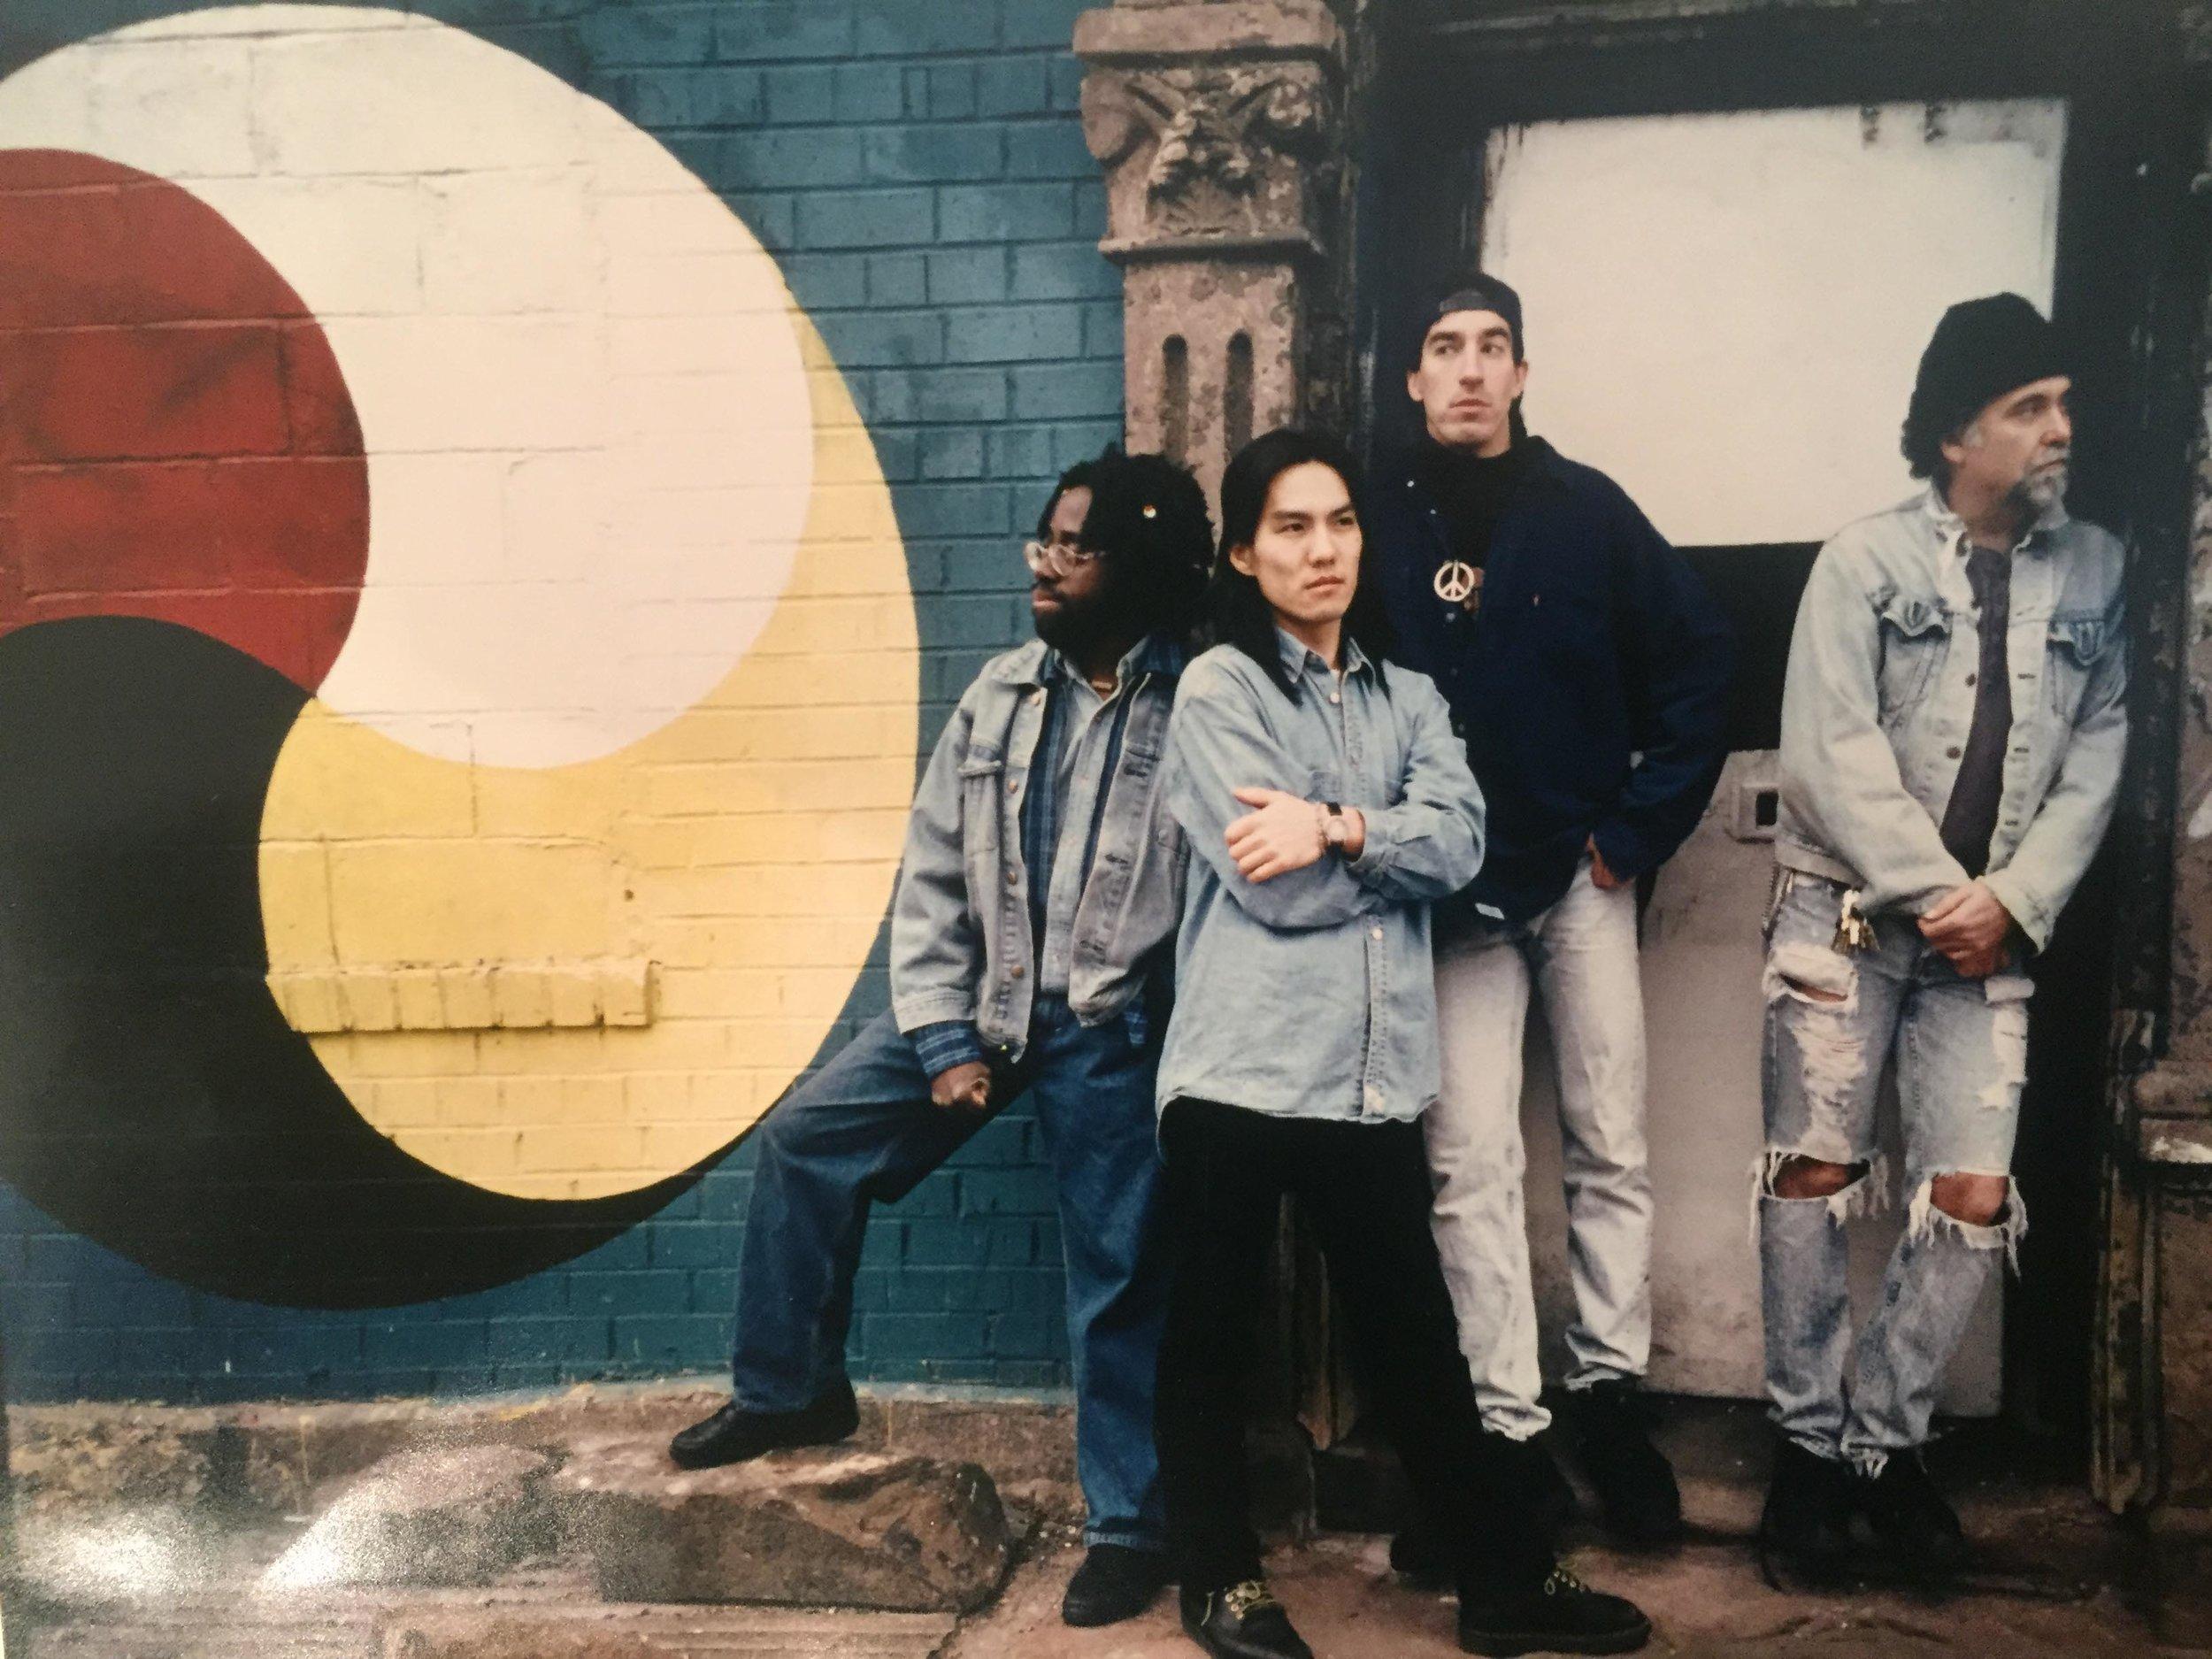 From left: Joe Copeland, Masa Shimizu, Milo Zwerling, Steve Hopkins. 1994.